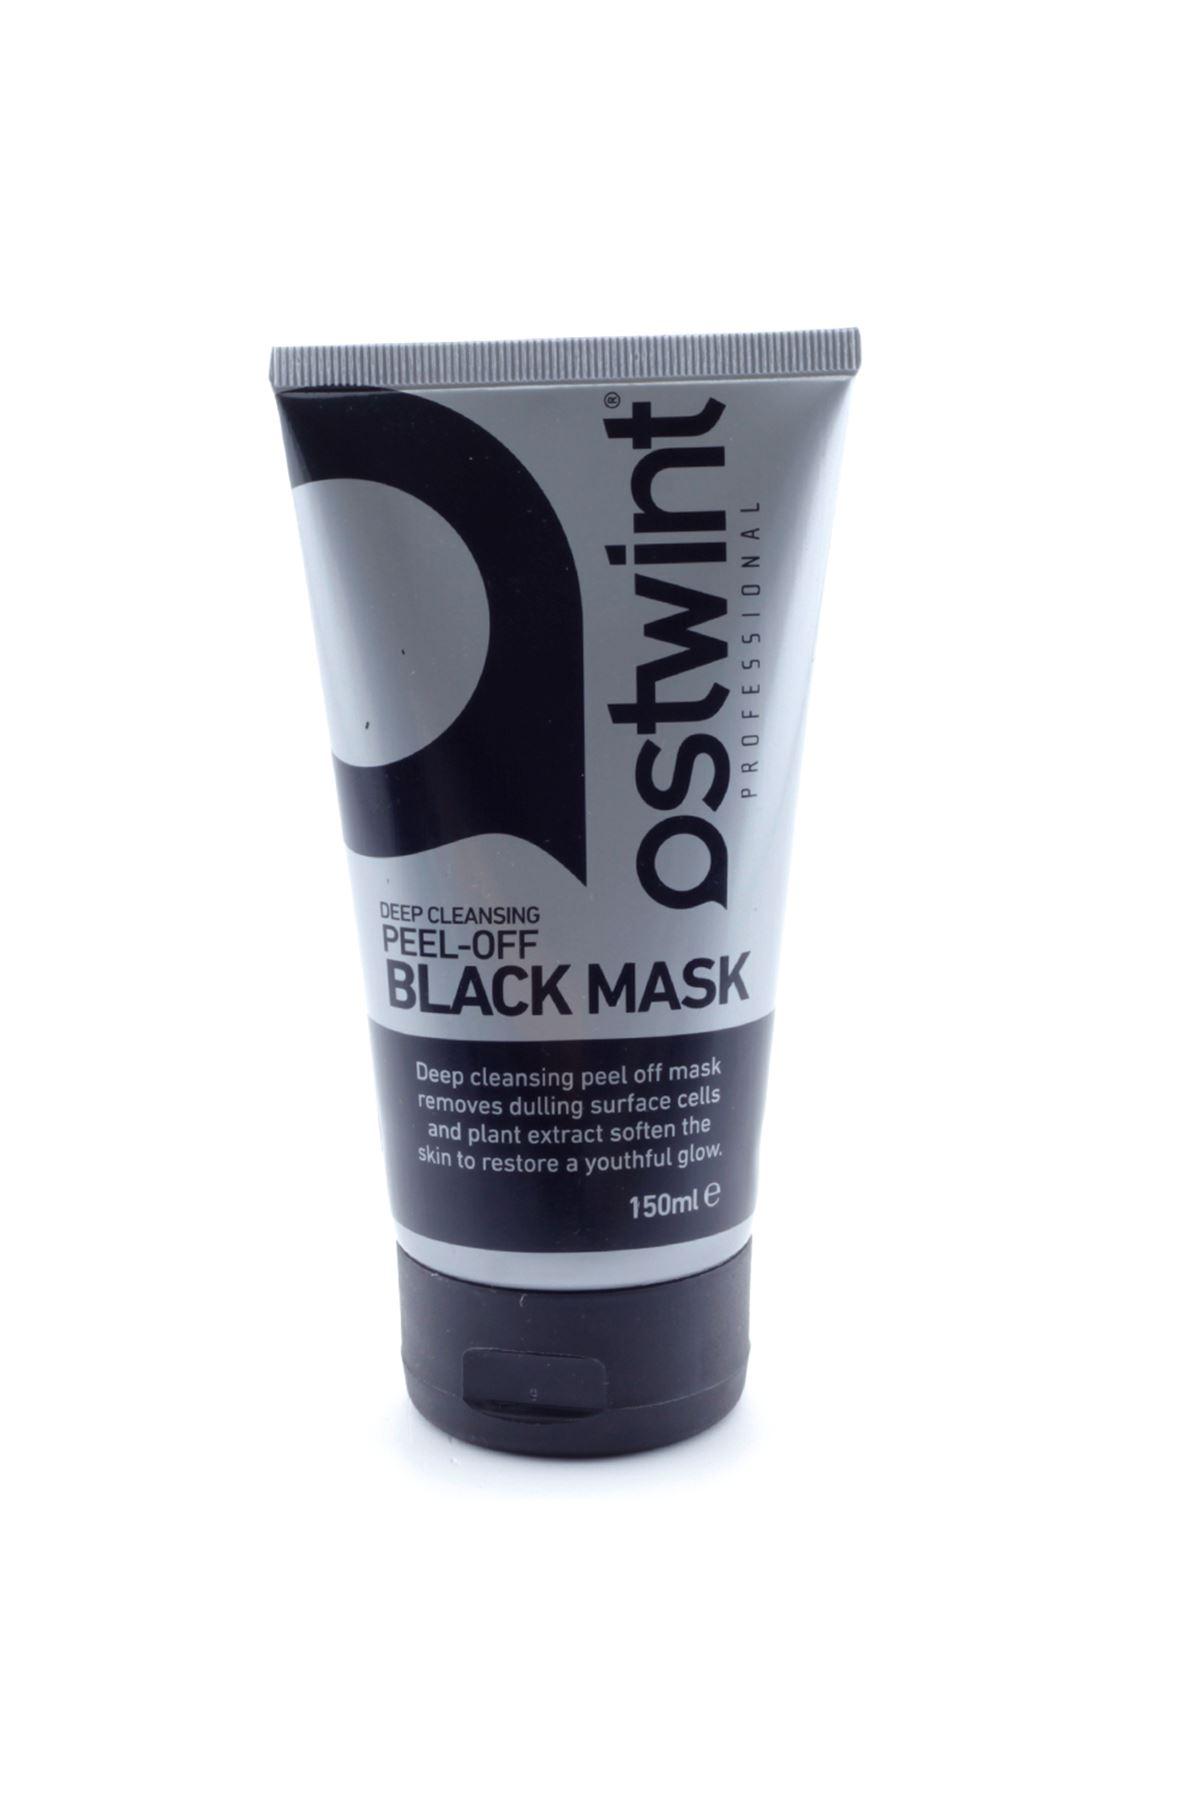 Ostwint SOYULABİLİR SİYAH MASKE 150ML PEEL OF BLACK MASK